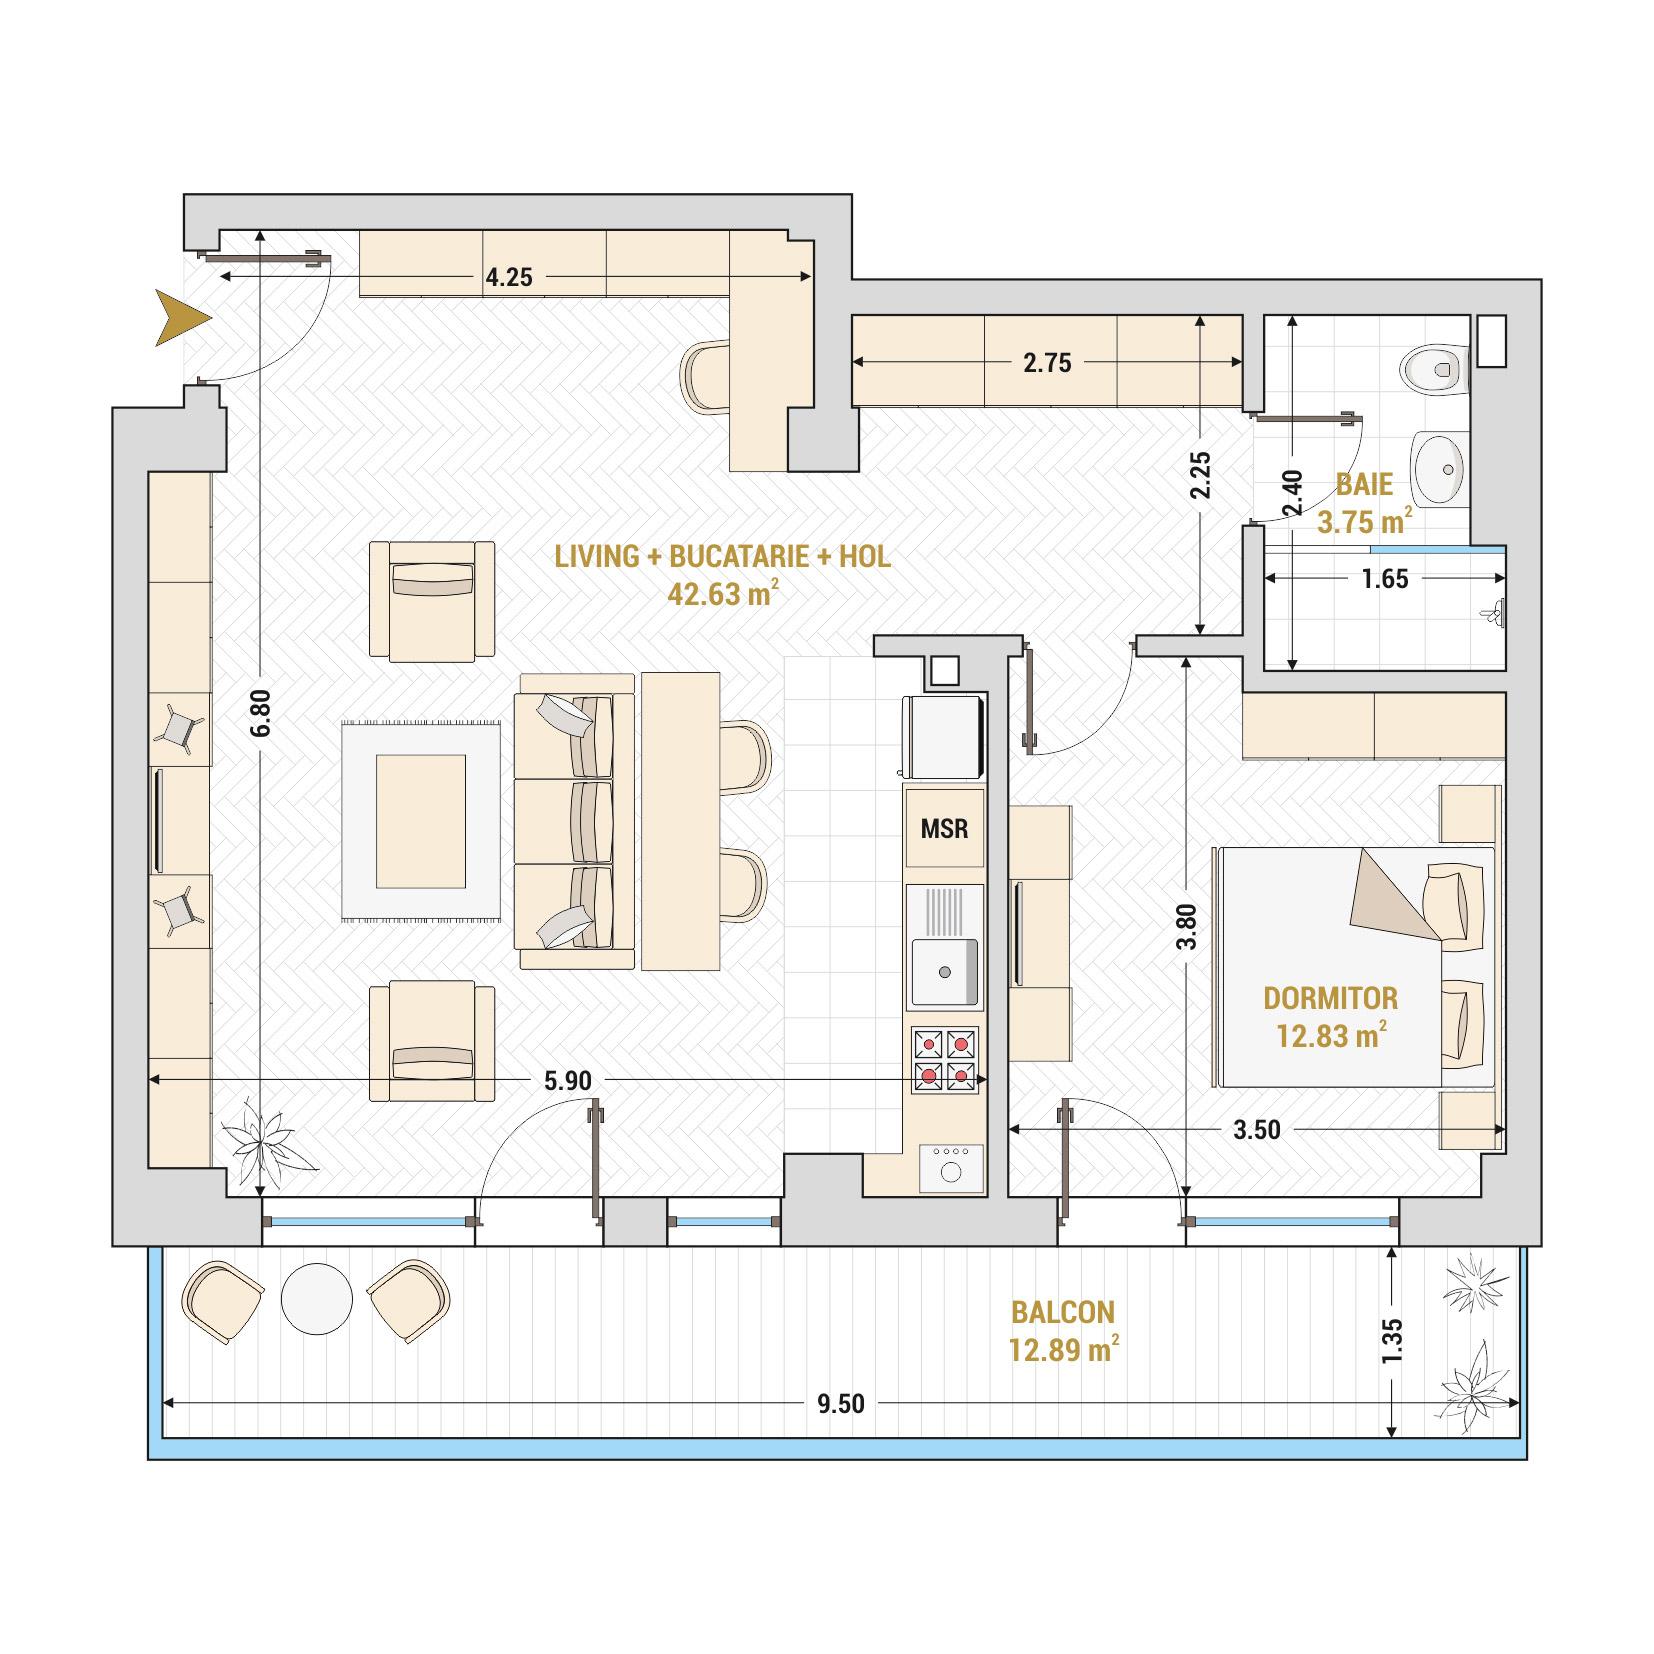 Apartamente cu 2 camere de vanzare Bucuresti - Catedral Residence - Marriott, Piata Unirii, 13 Septembrie, Izvor - Tip 7 - T1A